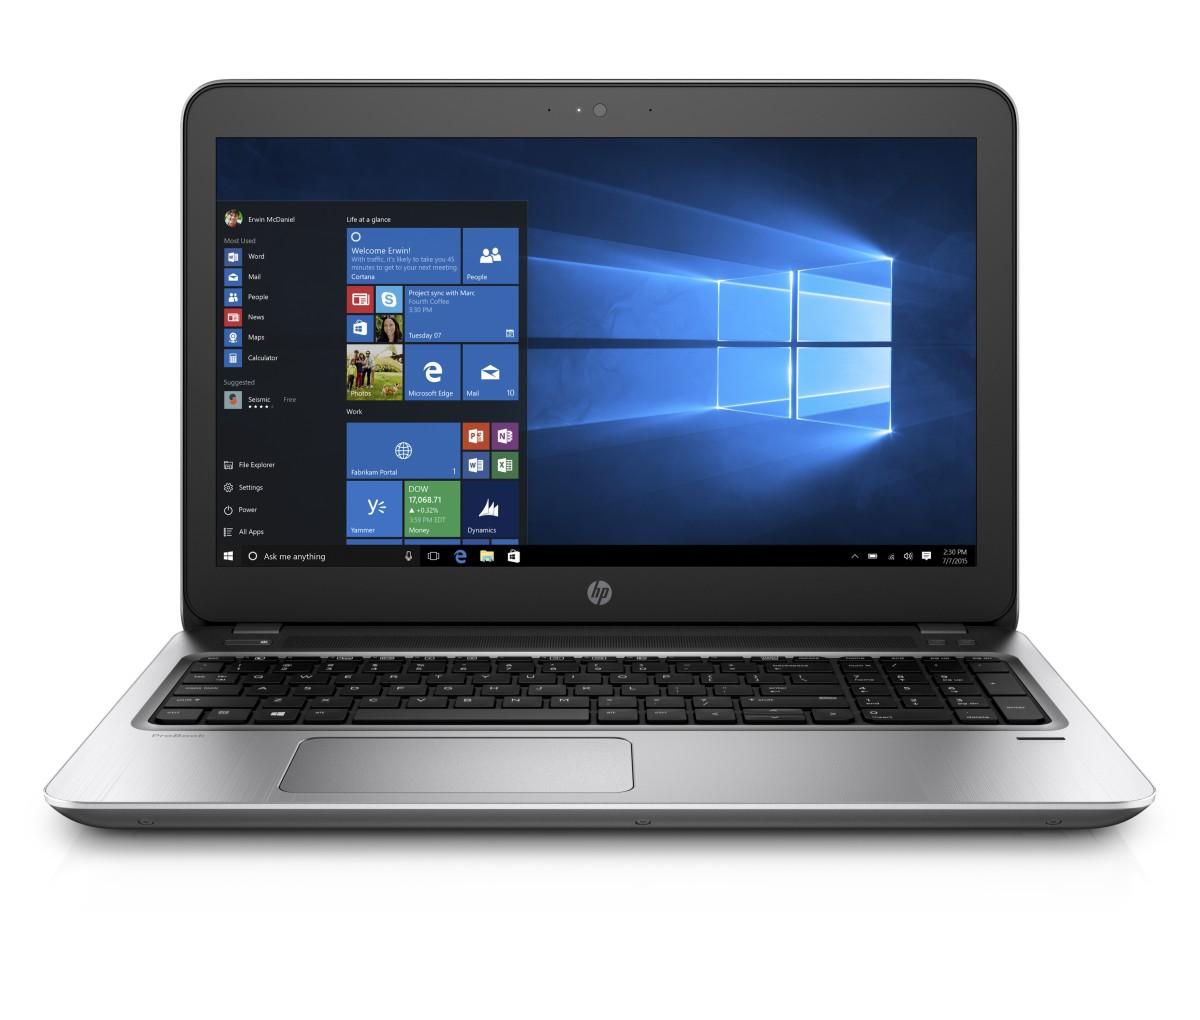 HP ProBook 450 G4 i5-7200U 15.6 FHD 8GB 128SSD+1TB GF930MX/2G DVD FpR W10